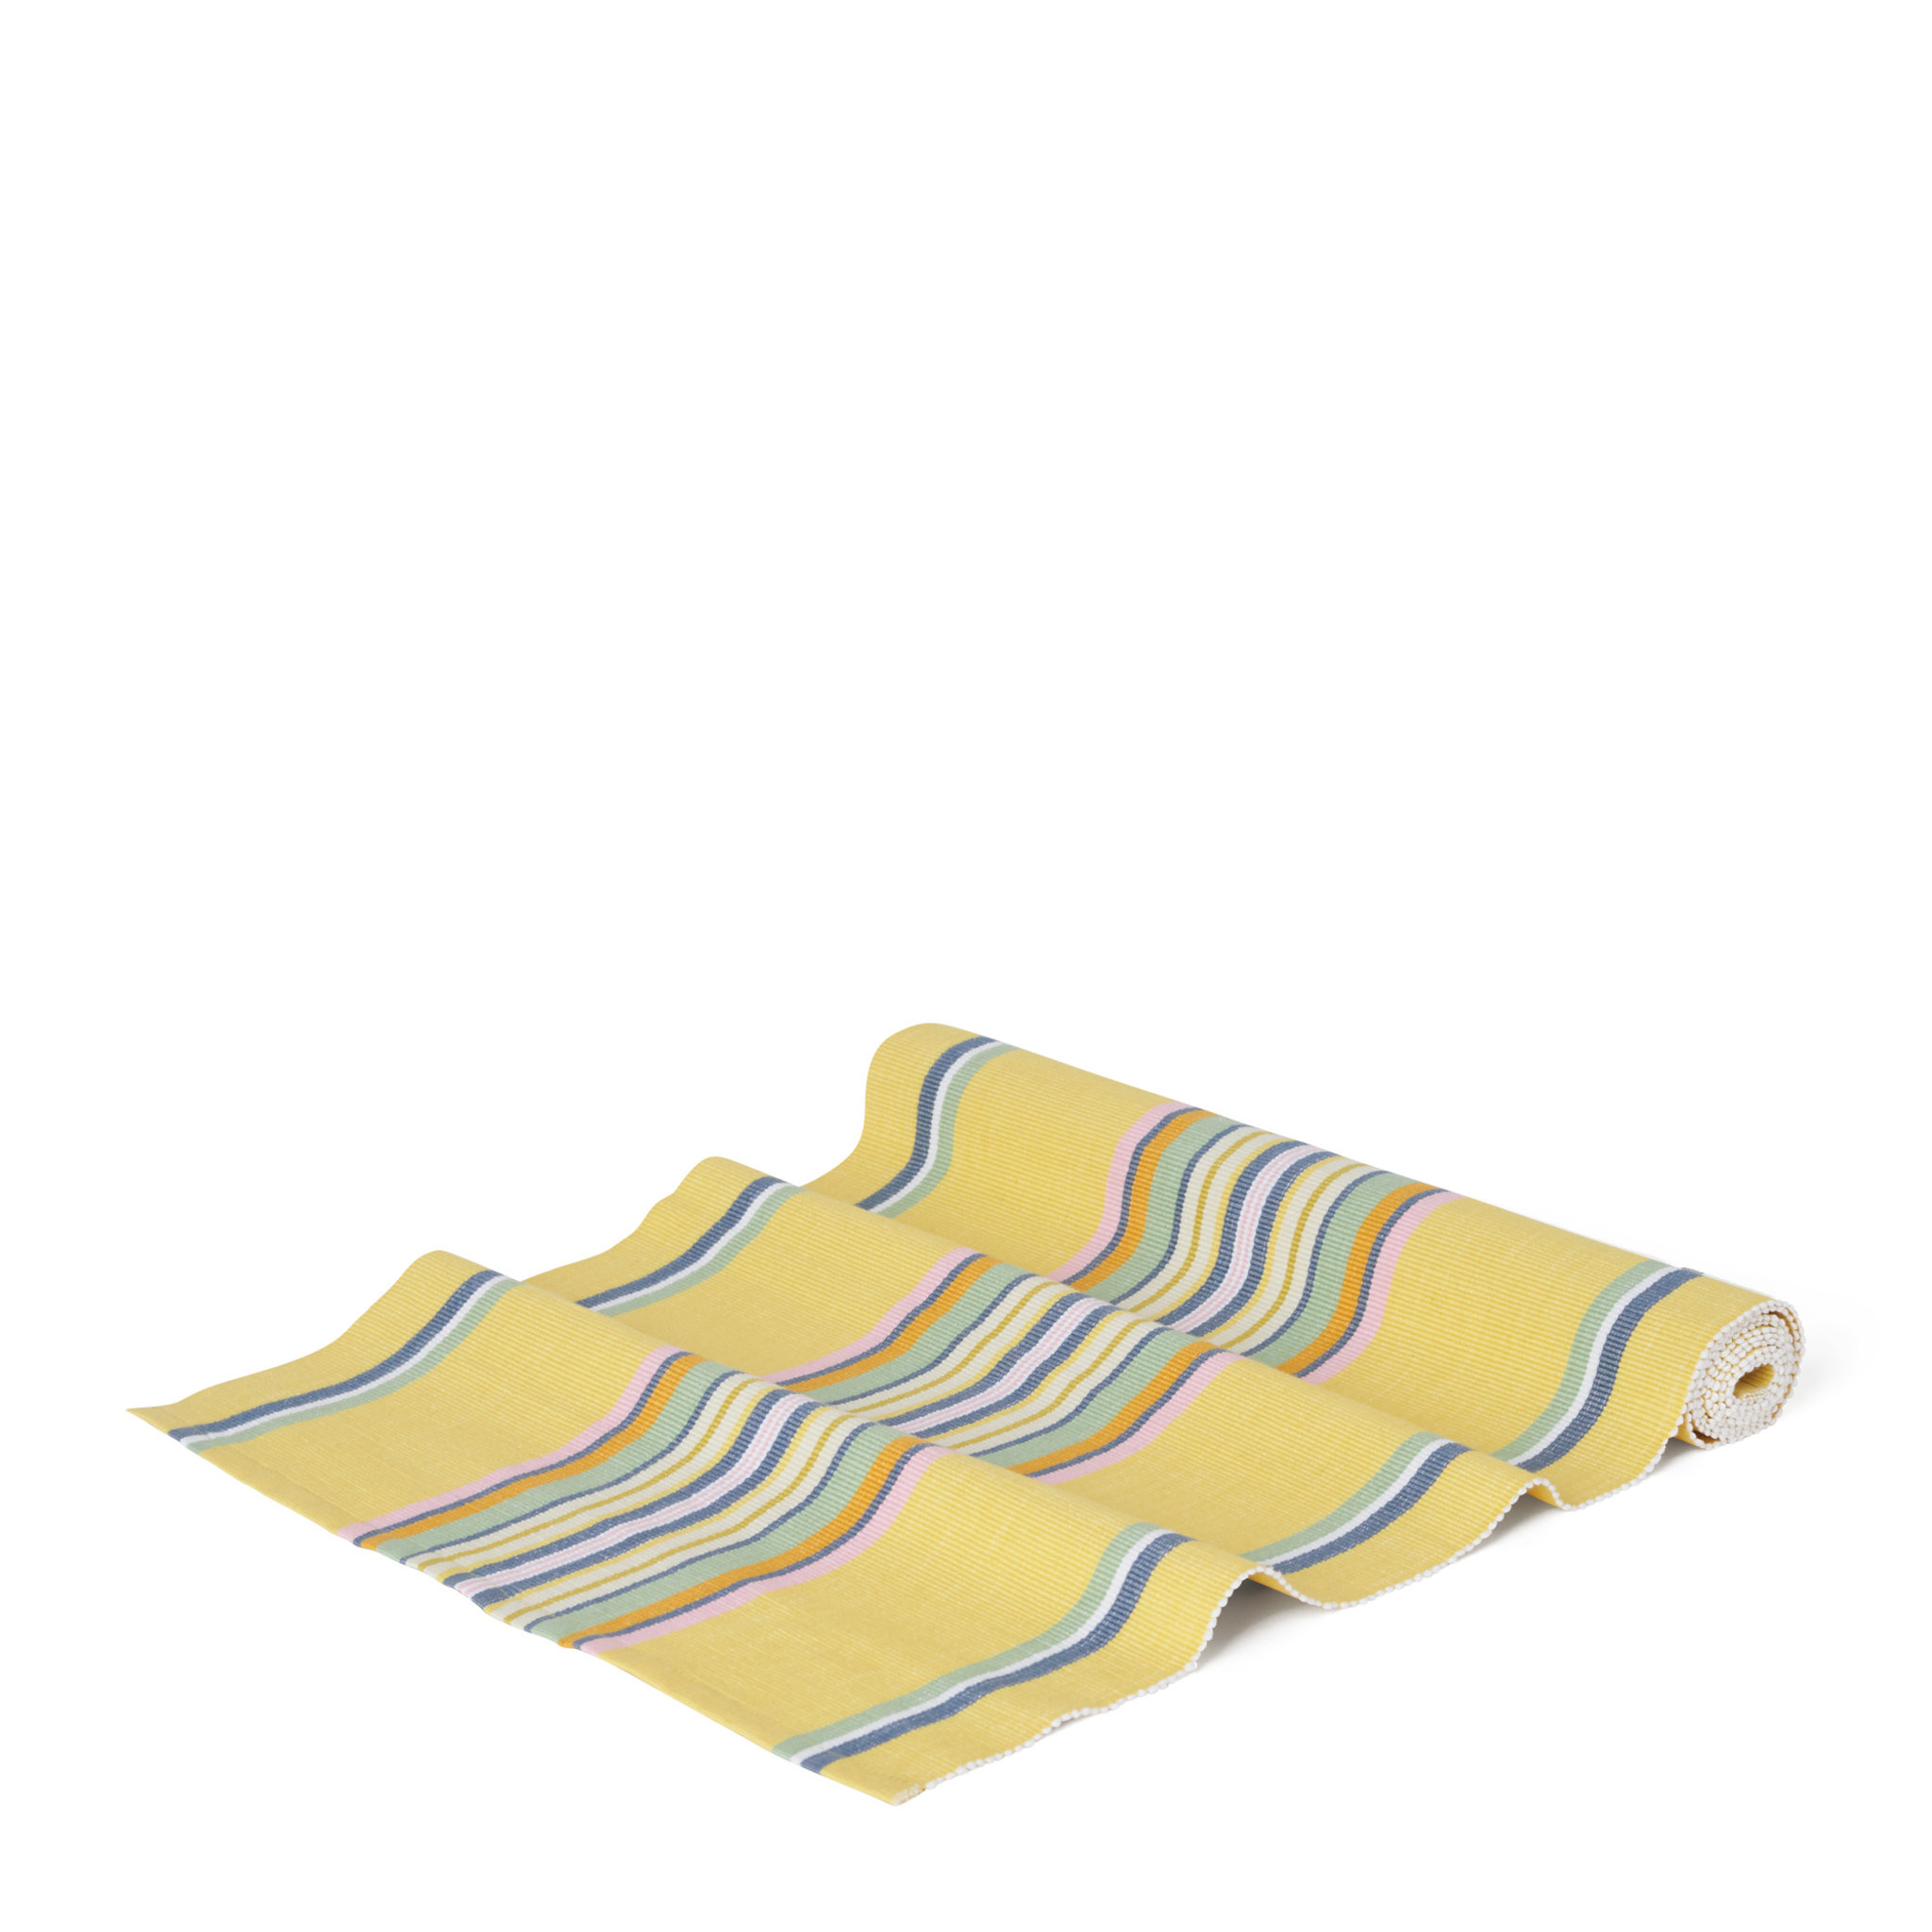 Löpare Pastell 34×120 cm.